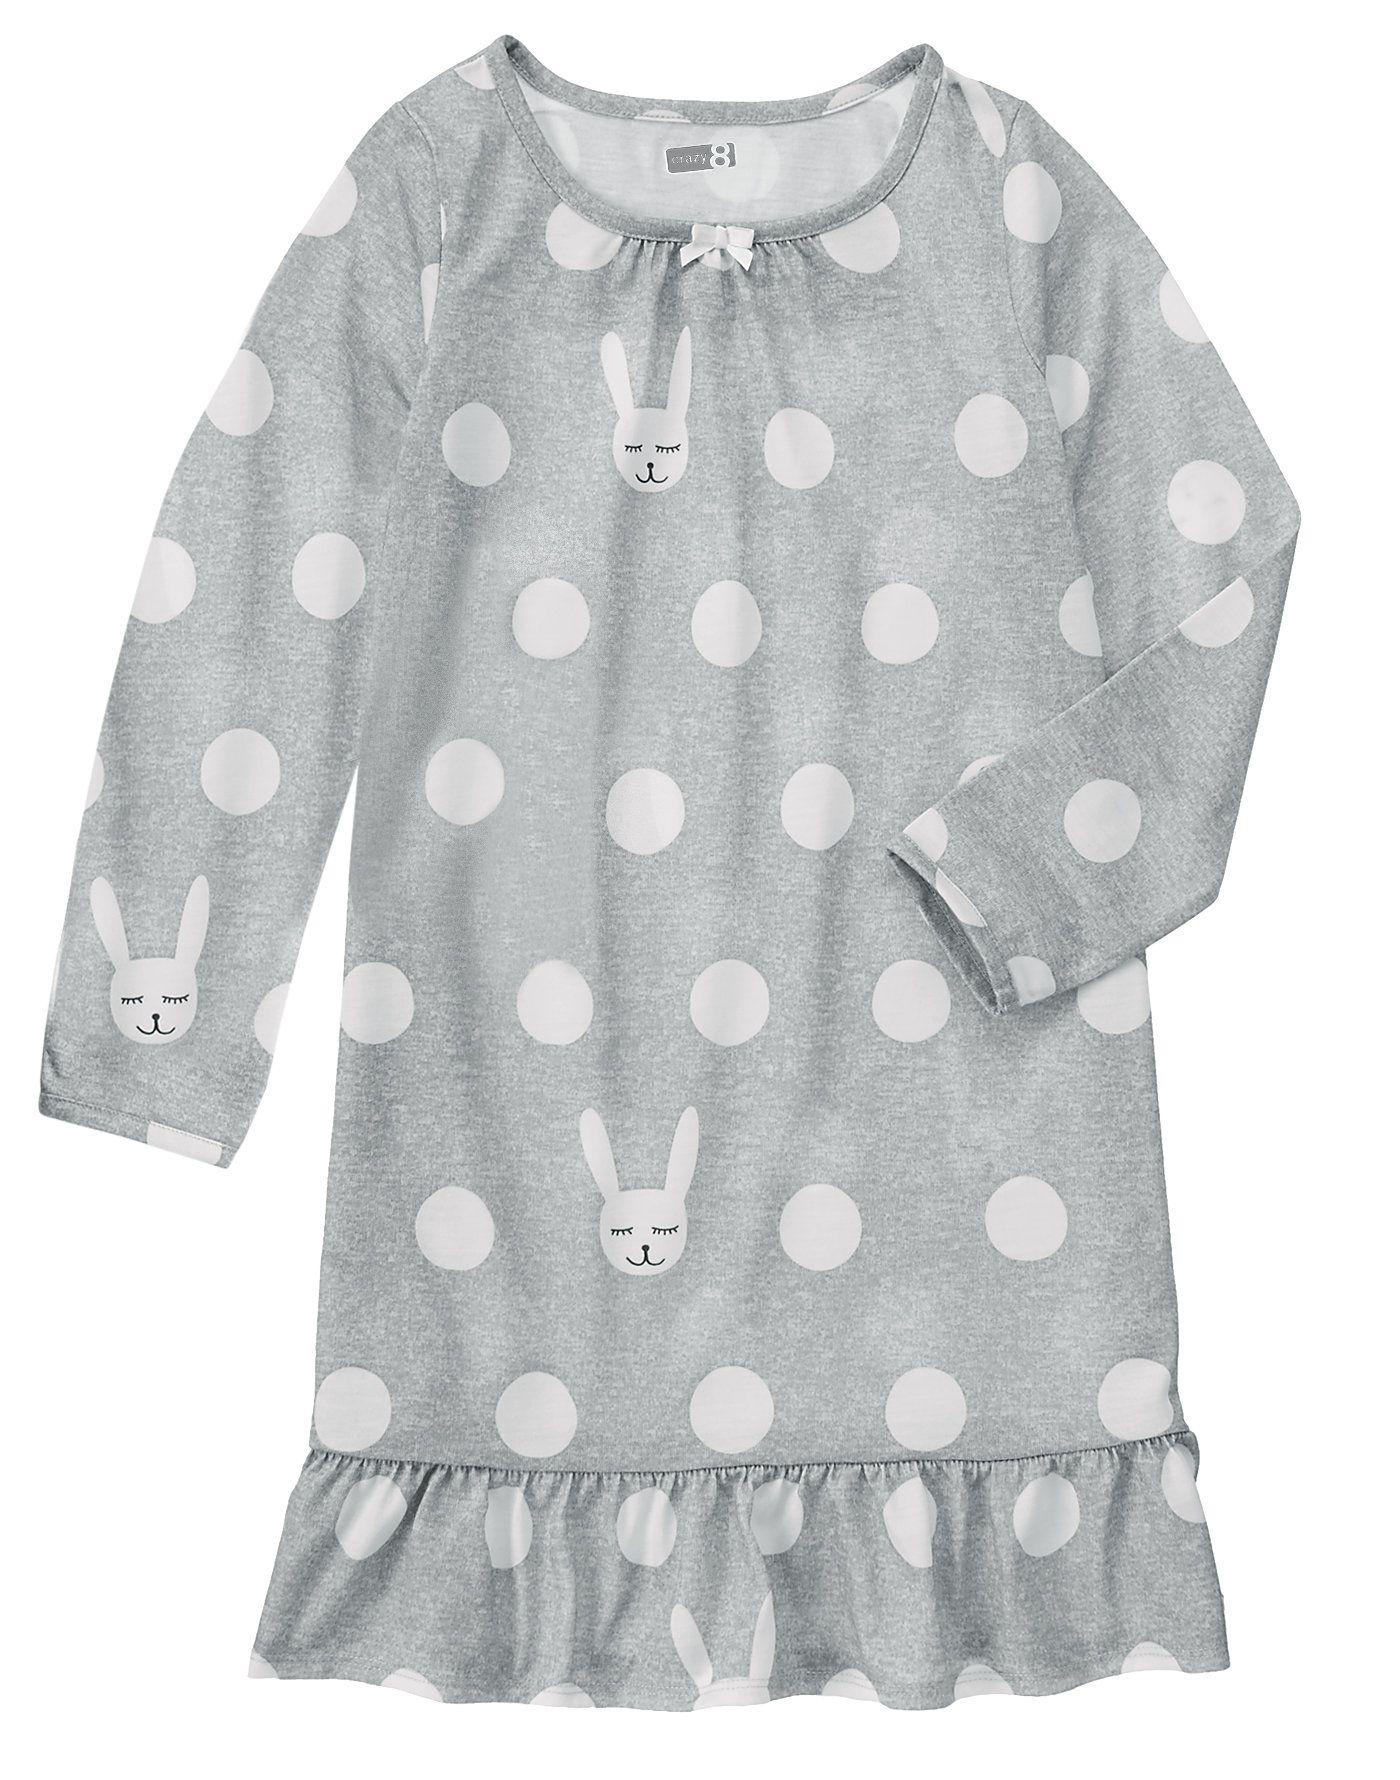 Bunny Print Pajama Gown at Crazy 8